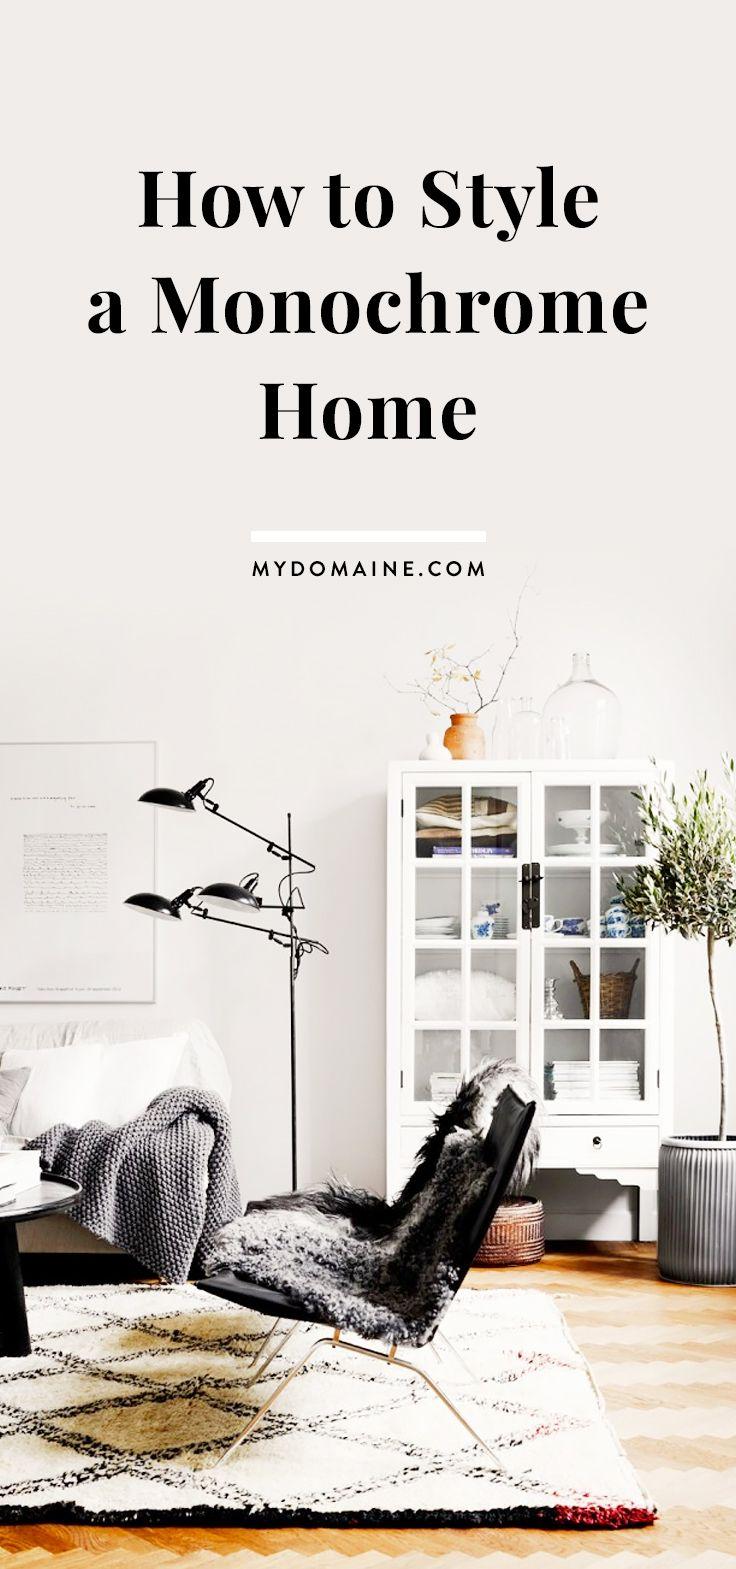 Monochrome living room decorating ideas